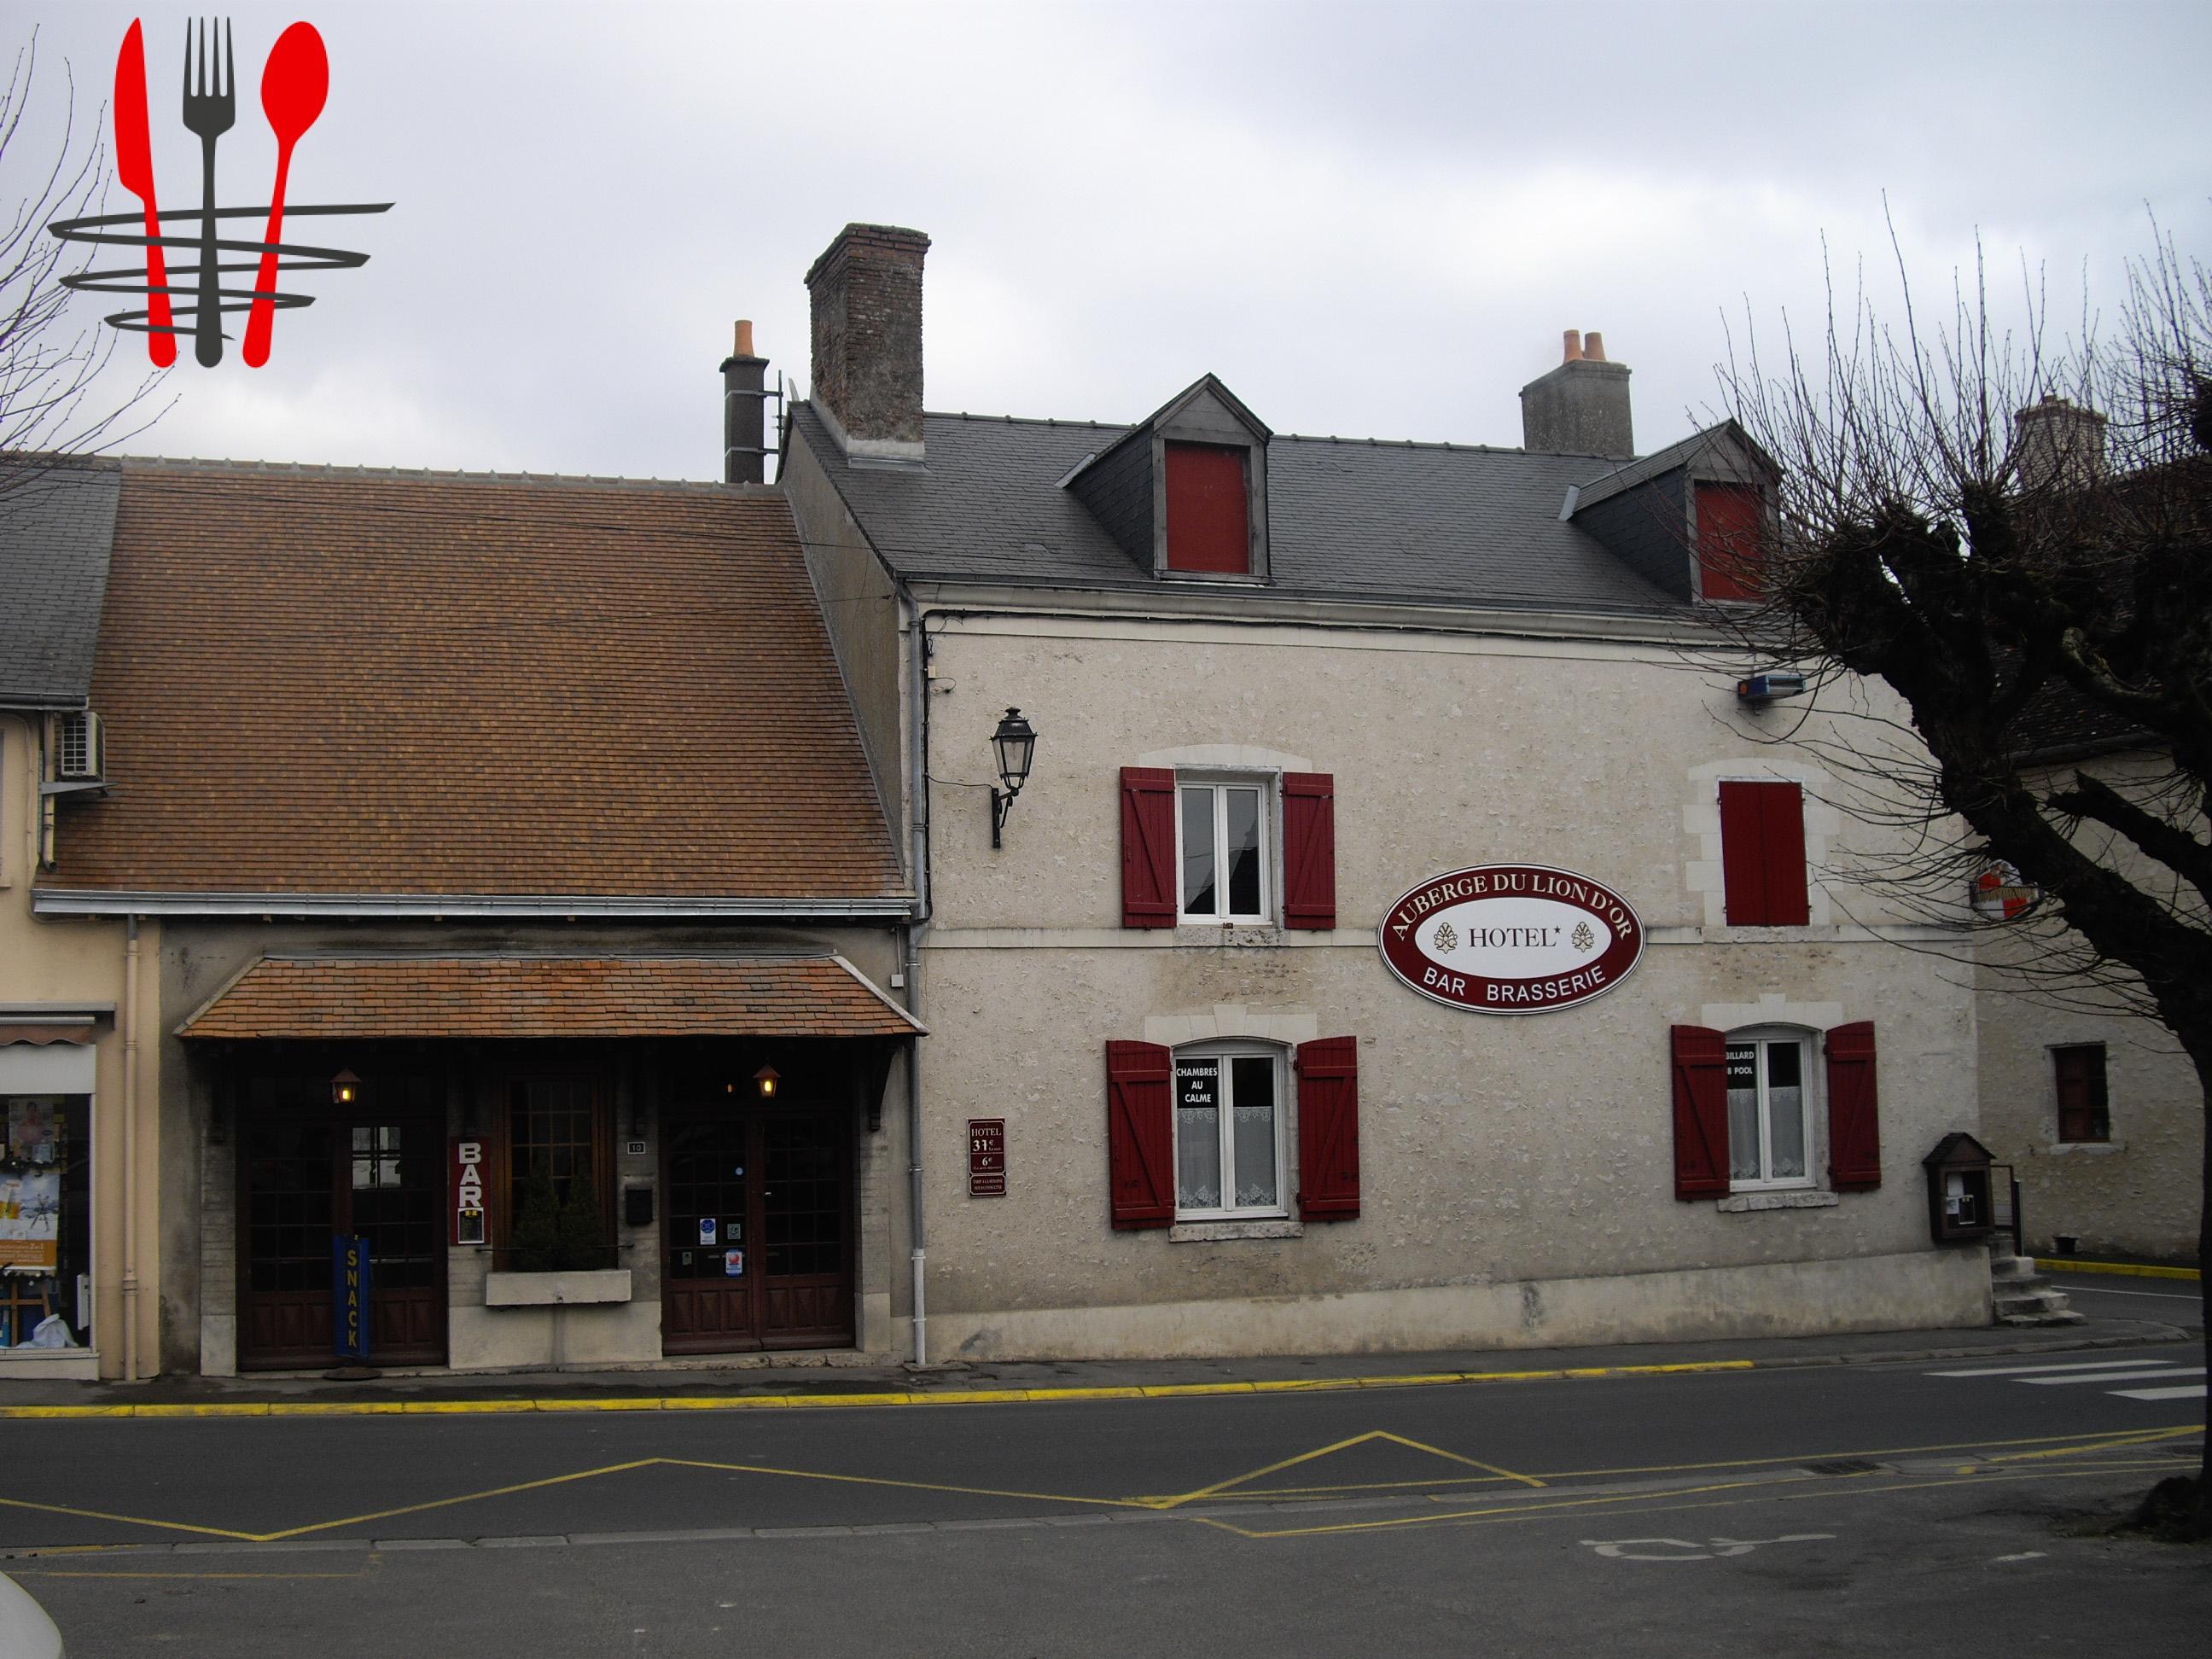 Hôtel, Bar, Brasserie: Murs+fond